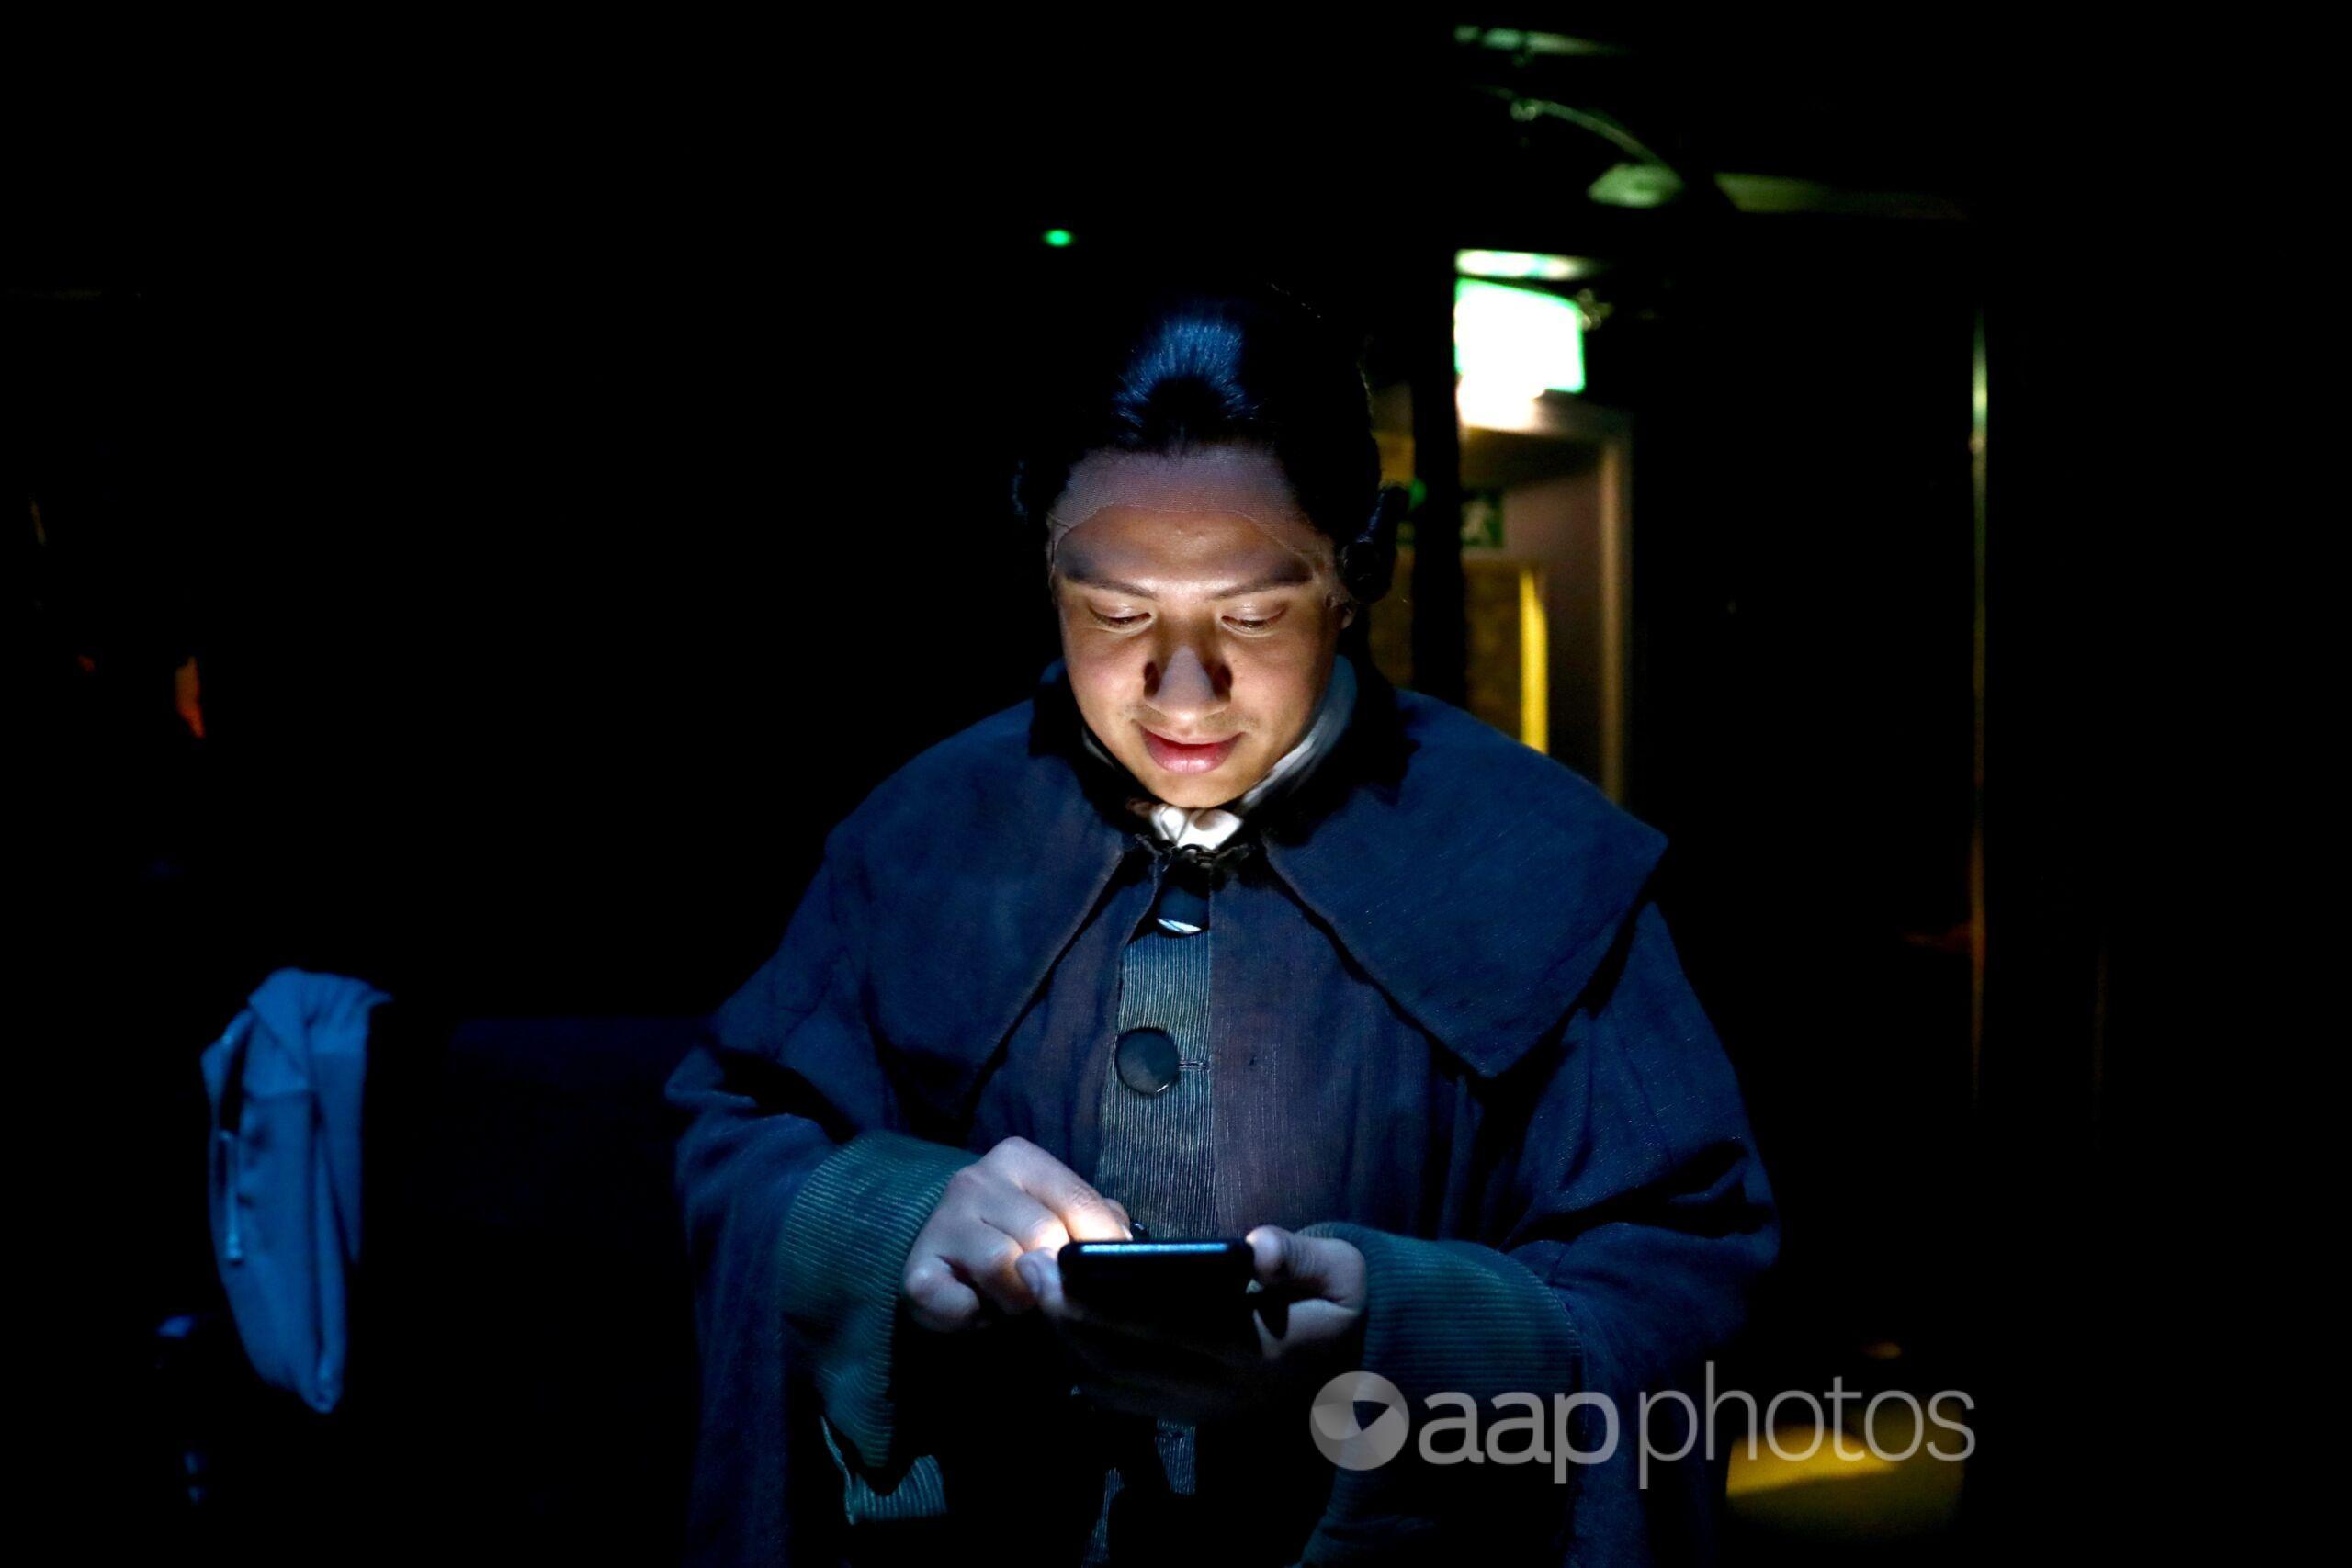 A man checks his mobile phone.